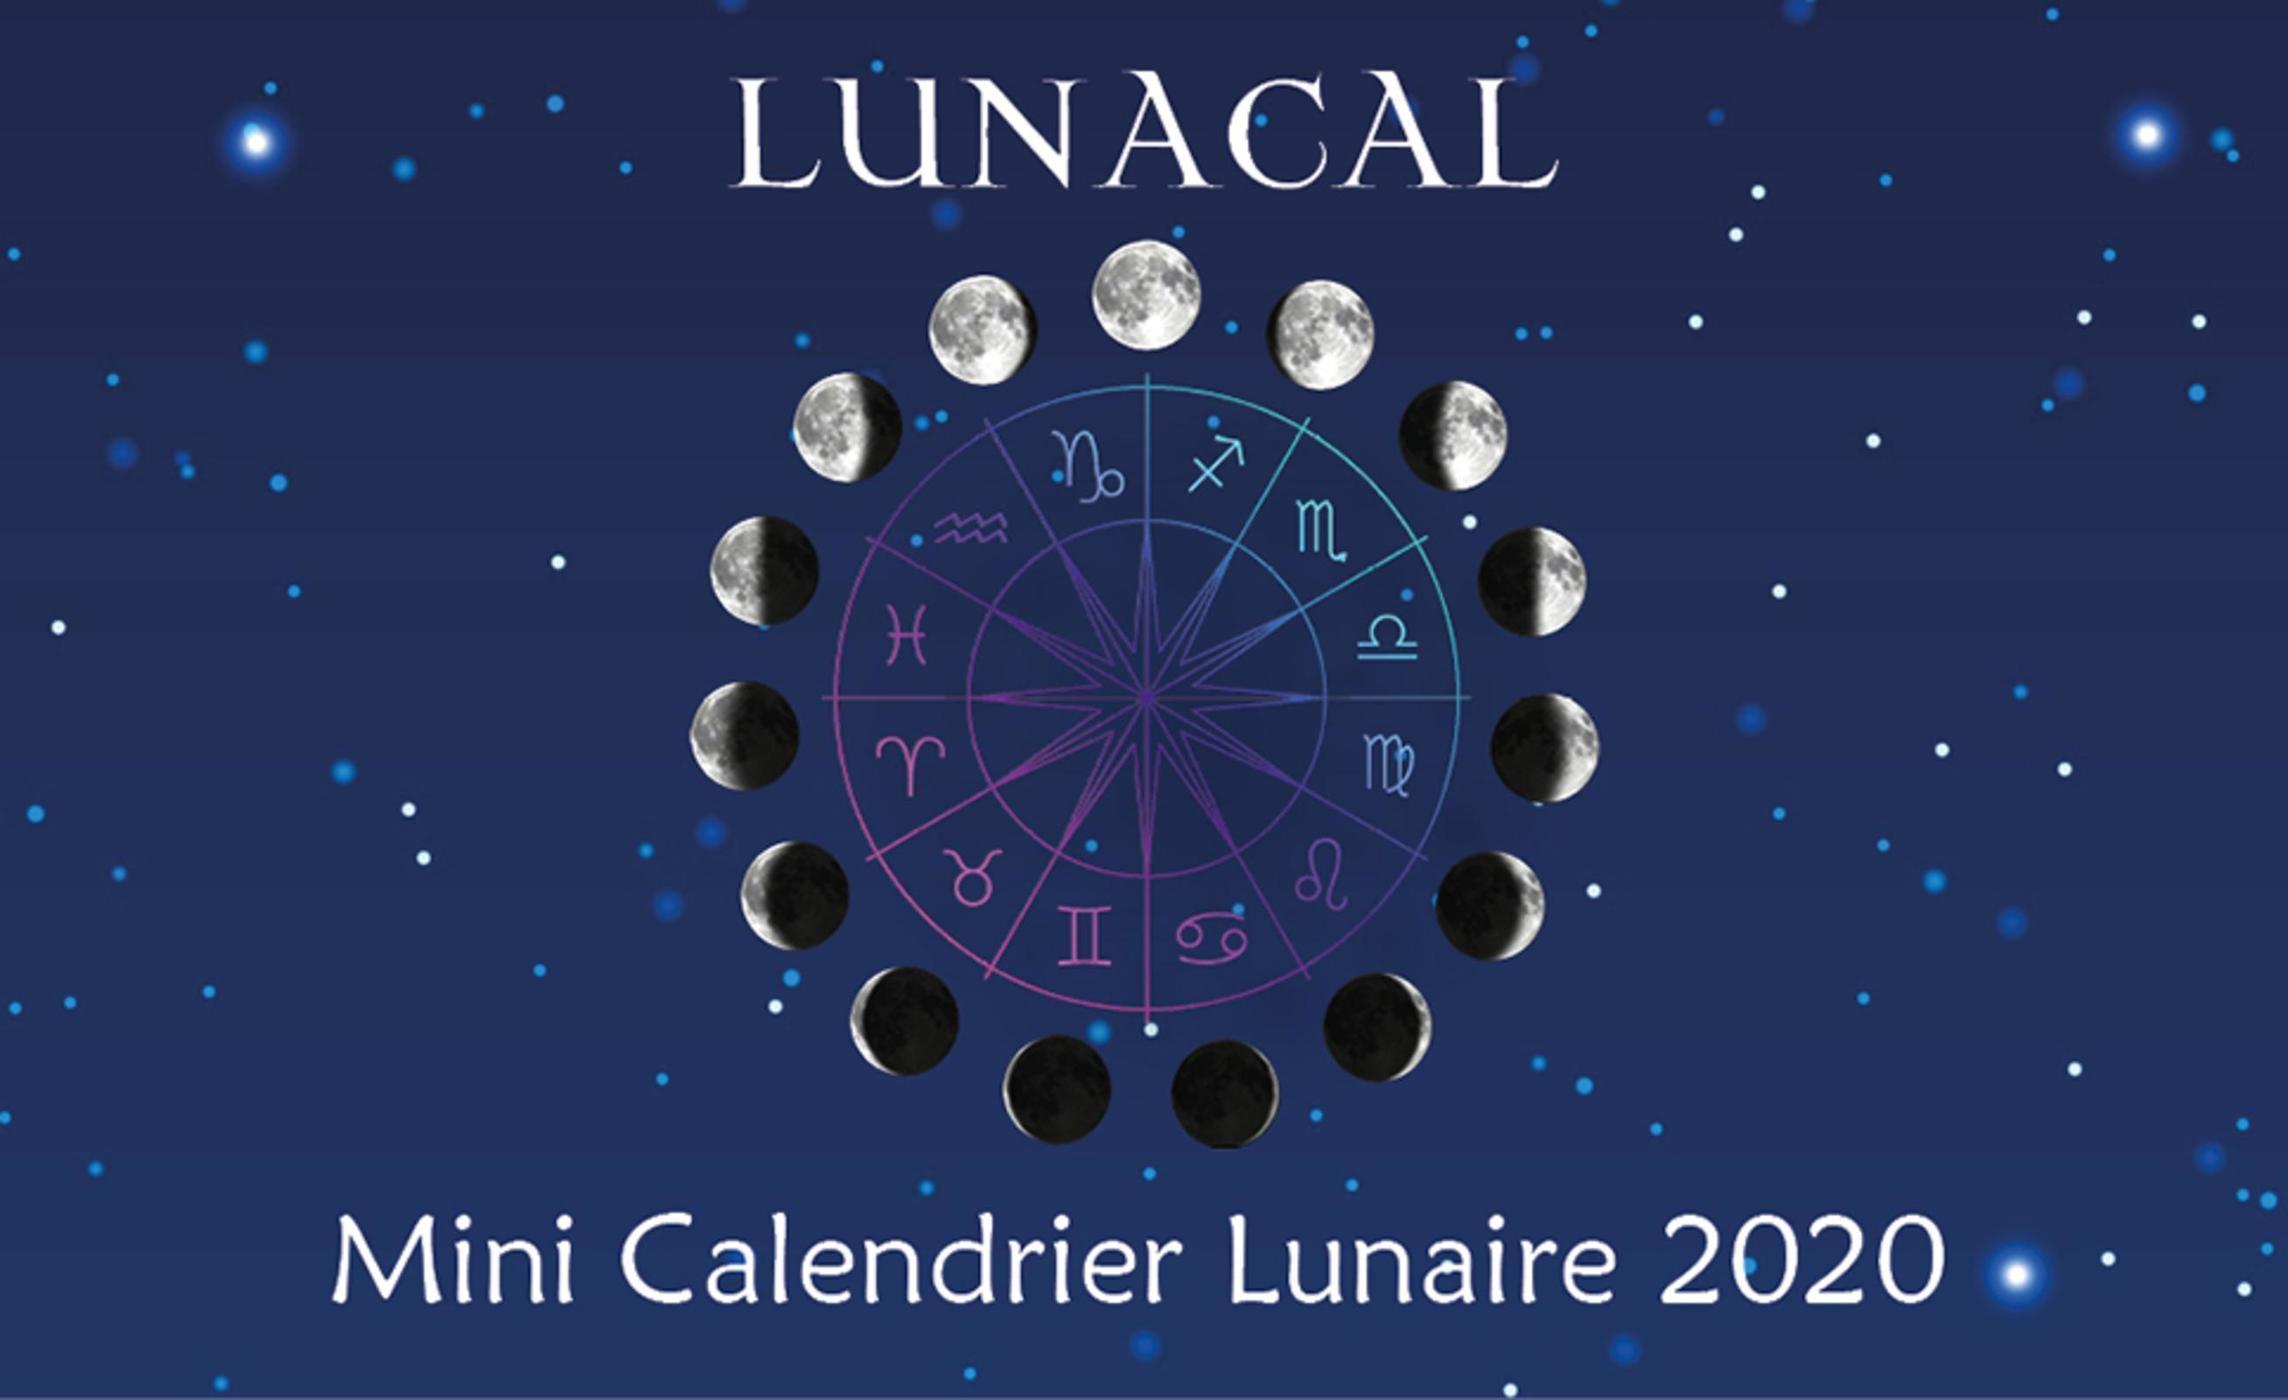 Calendrier Lune 2020.Lunacal Mini Calendrier Lunaire 2020 Collectif Alliance Magique Librairie Eyrolles